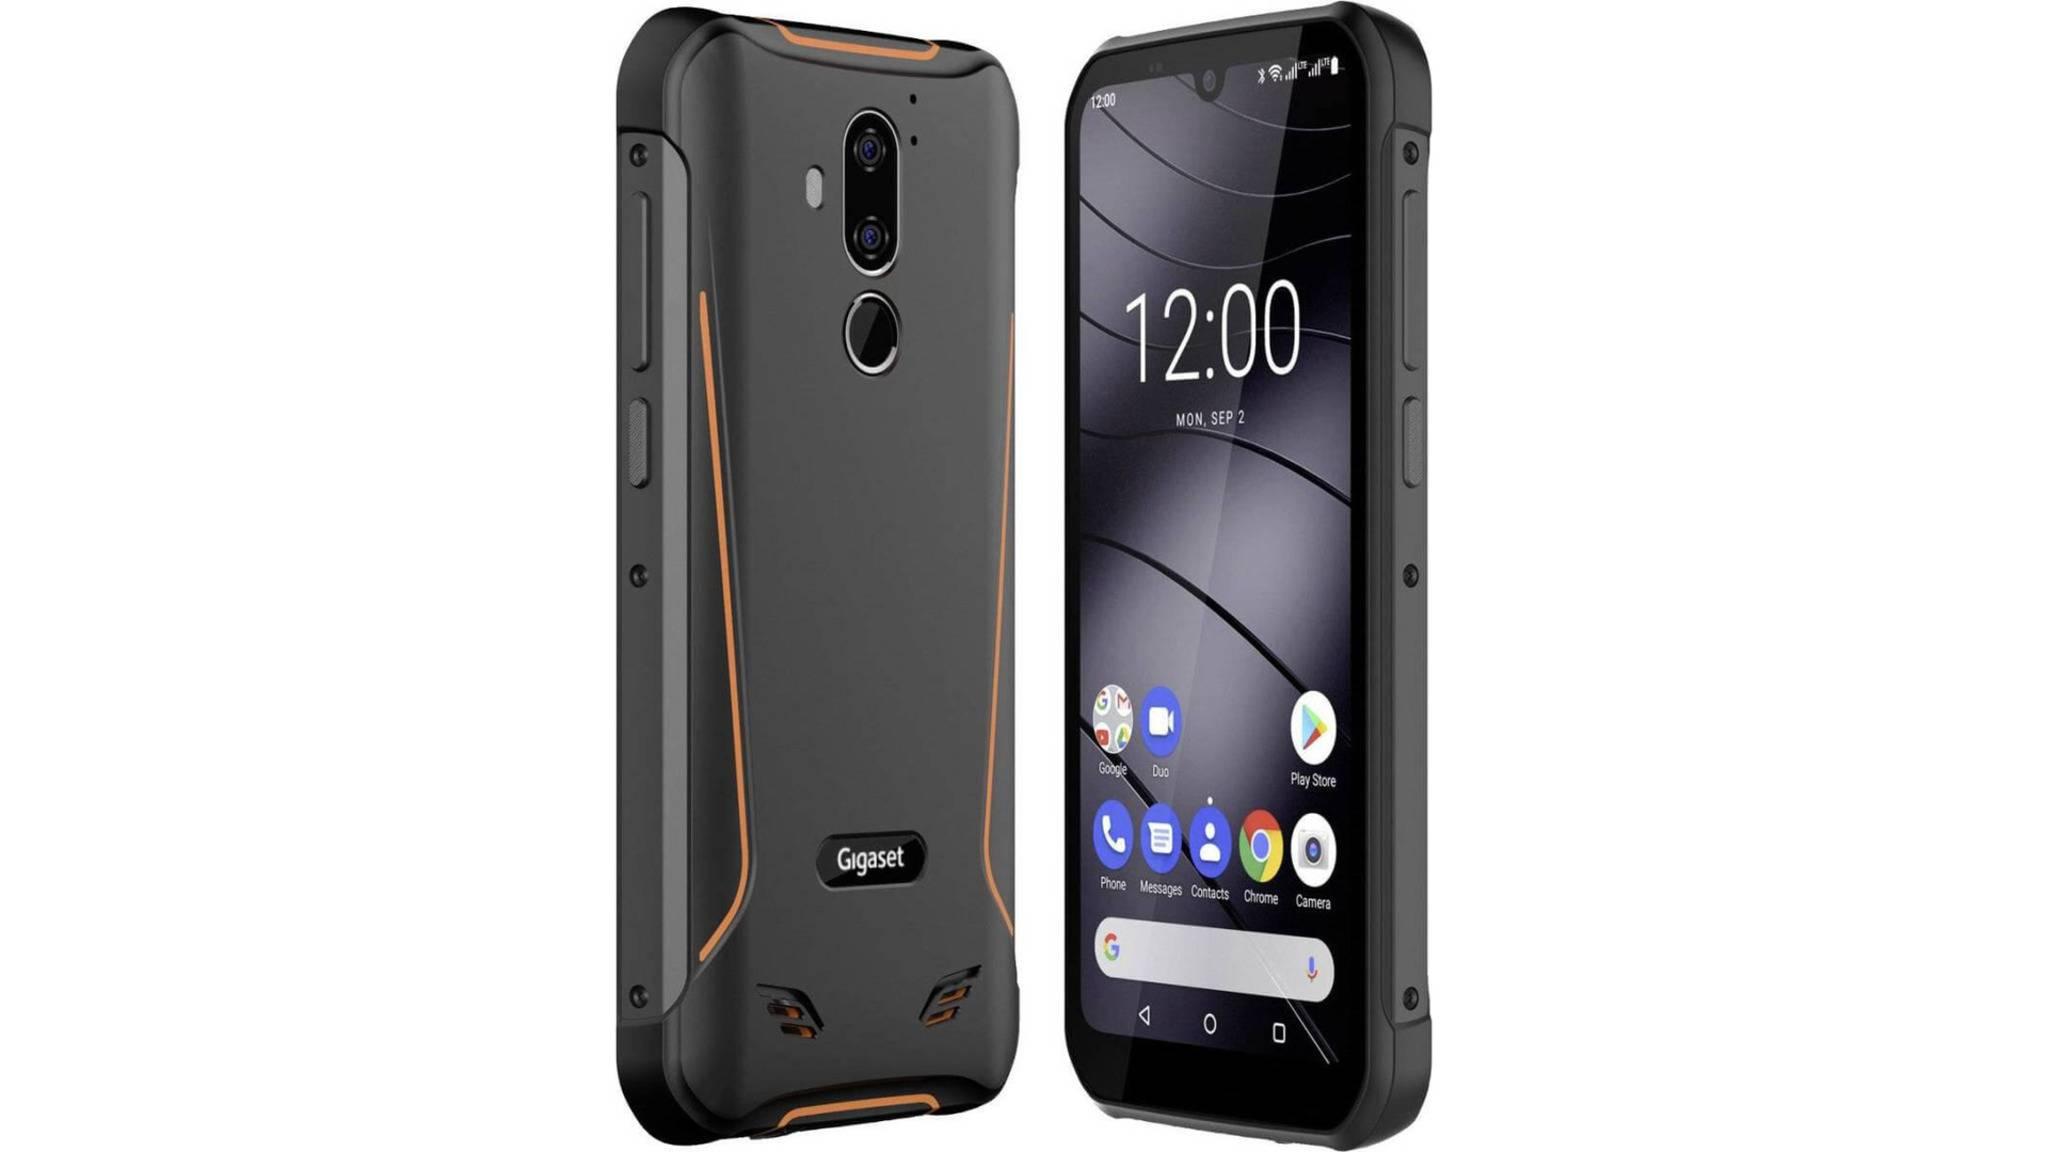 gigaset-GX290-smartphone